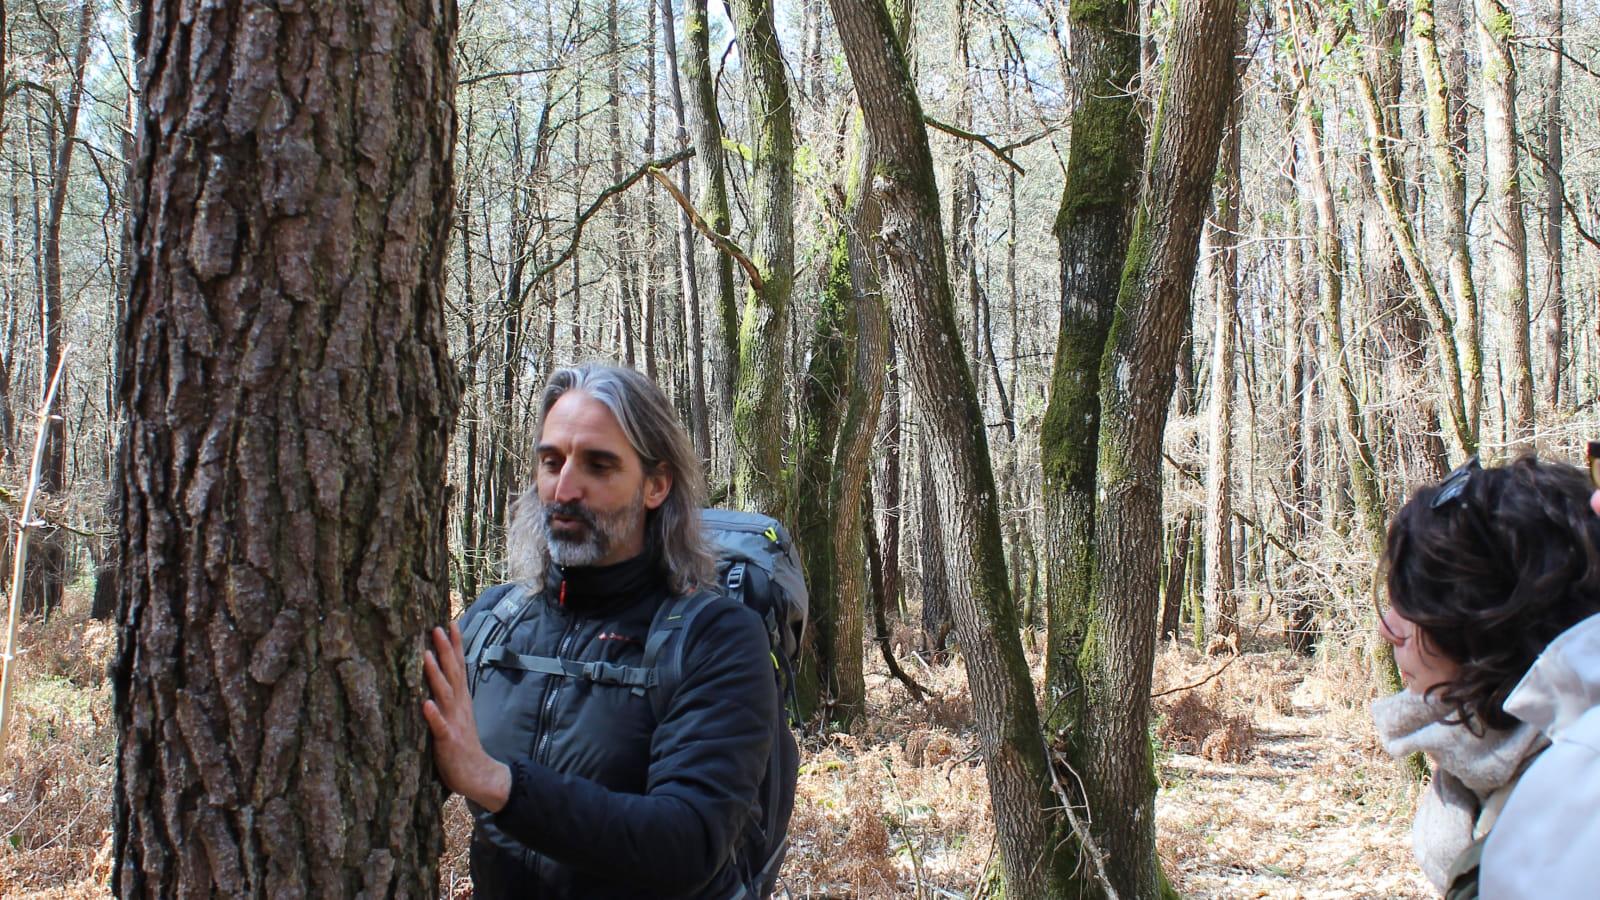 Omtani, Bain de forêt